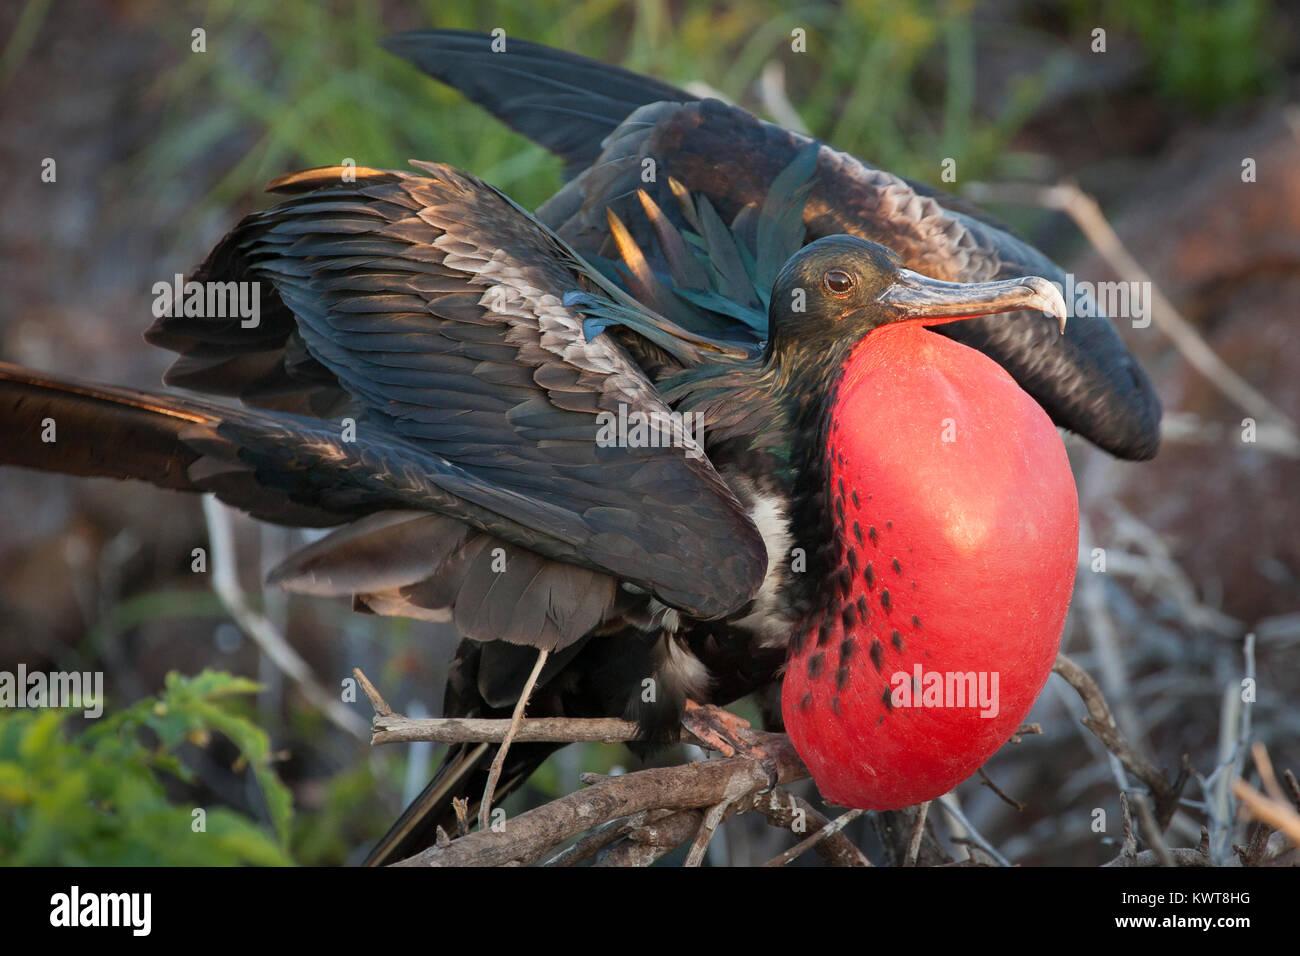 Great frigatebird (Fregata minor) with bright red inflated gular sac during a display. Genovesa, Galapagos. - Stock Image